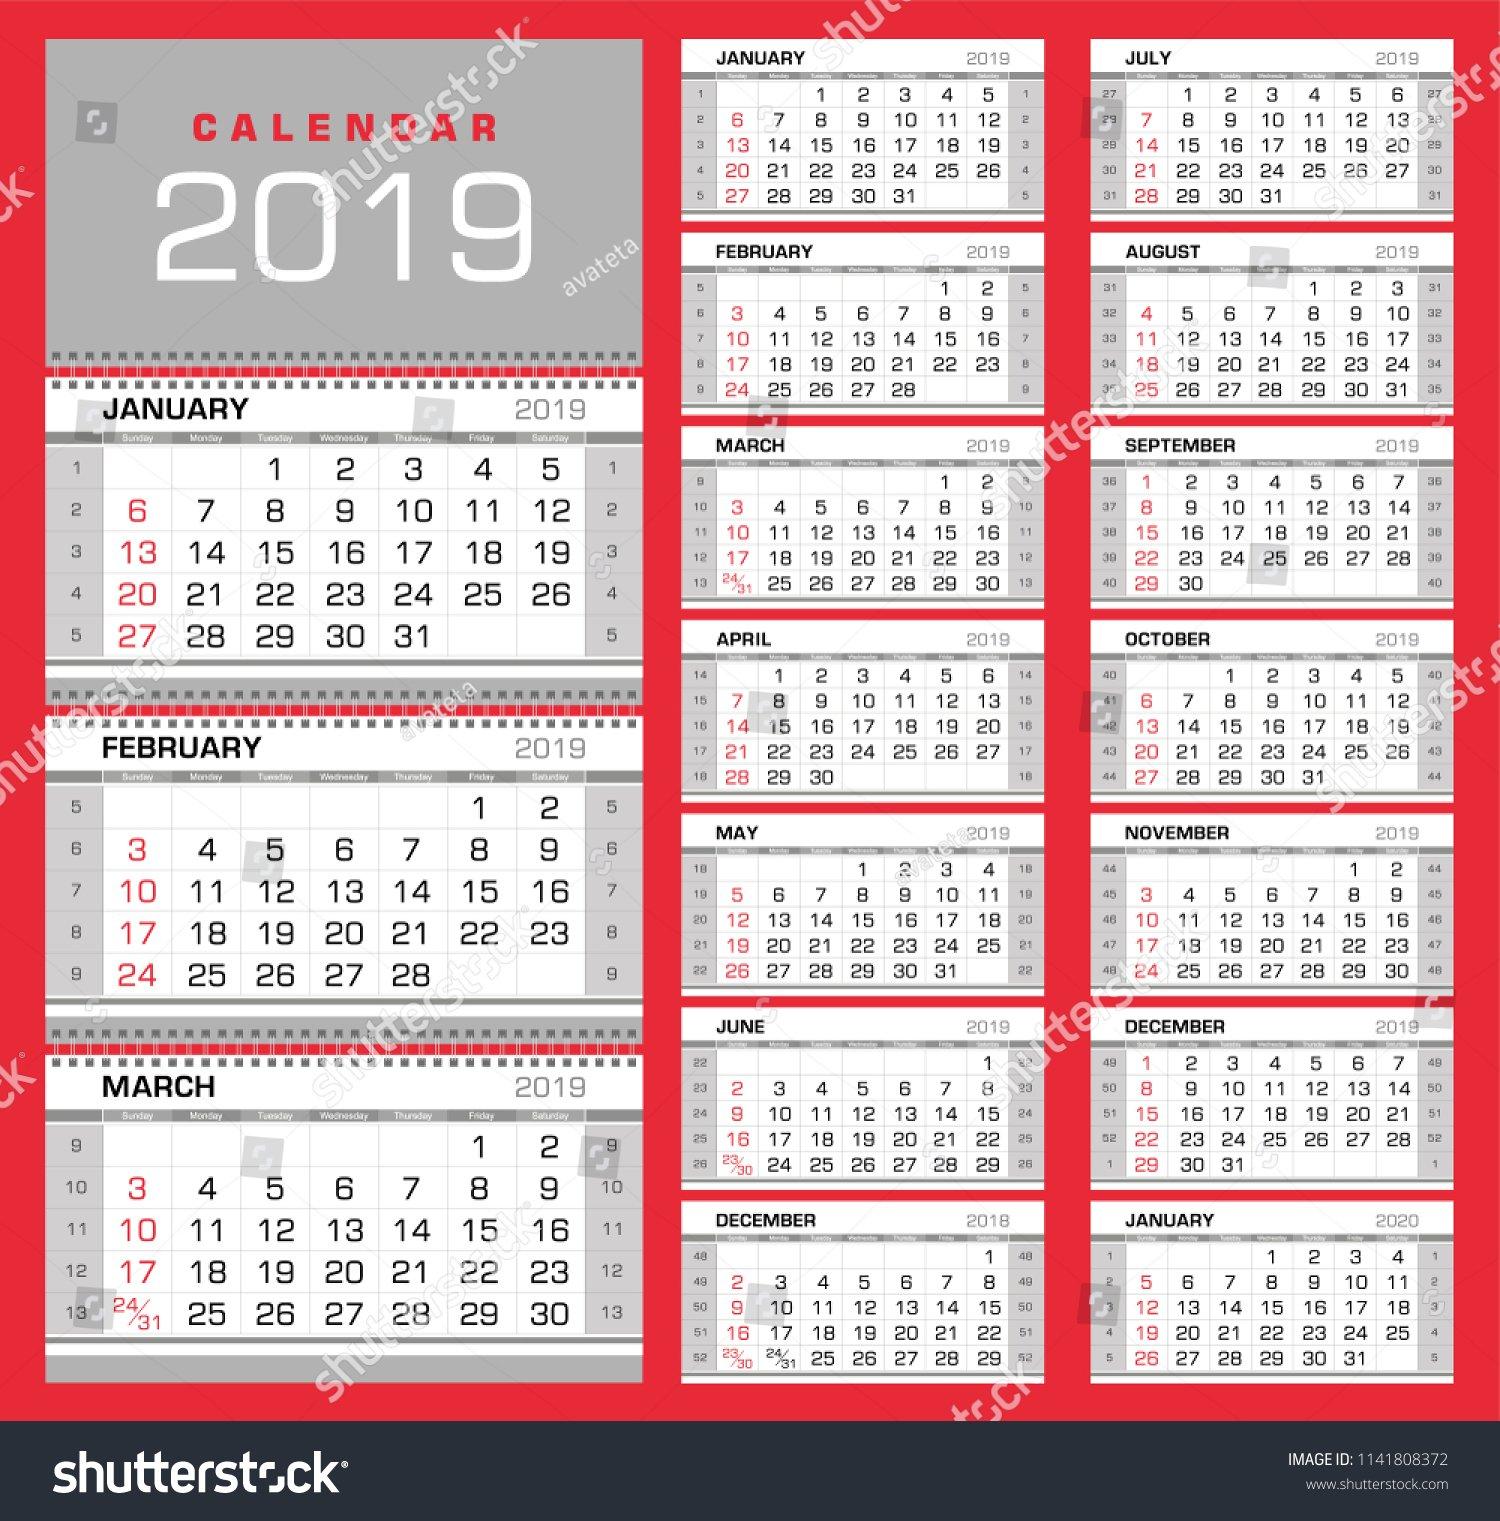 Стоковая Векторная Графика «Wall Quarterly Calendar 2019 Numbers 1 31 To Print